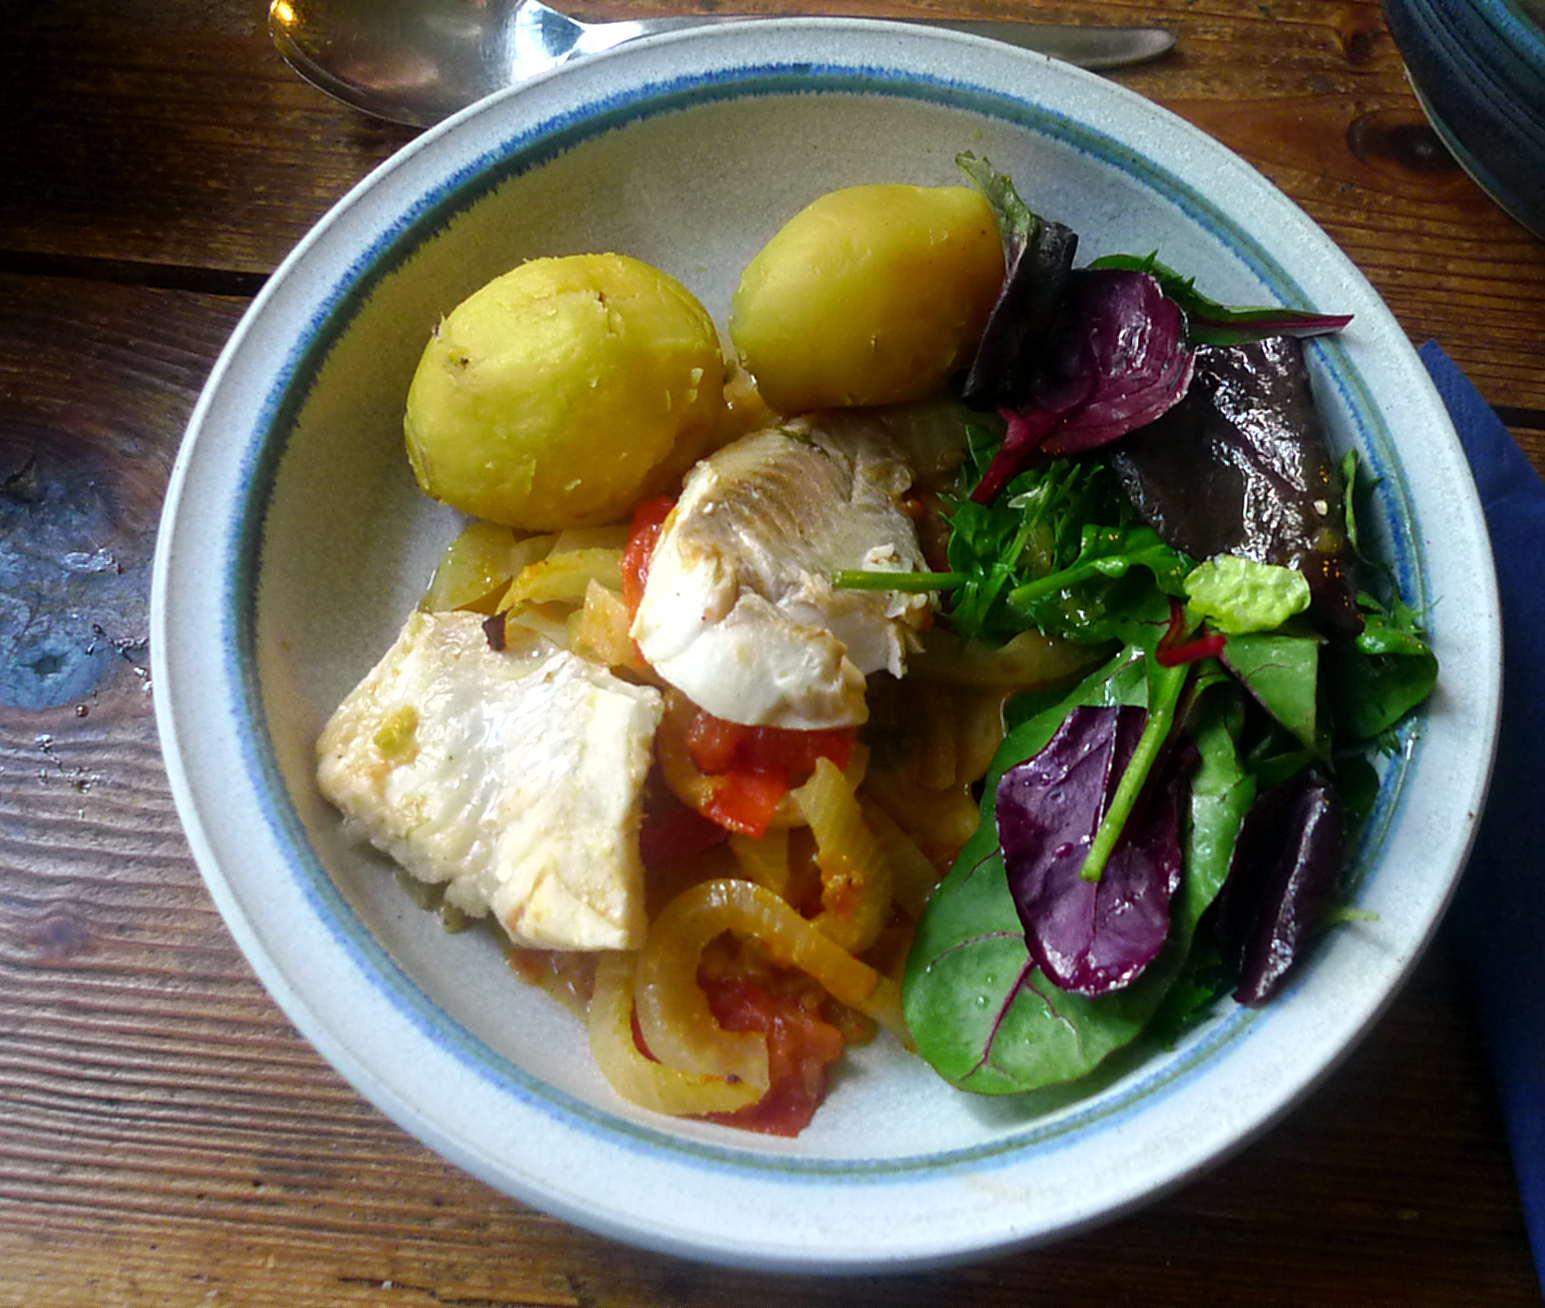 8.2.16 - Rotbarsch,Fenchel,Kartoffel,Salat,pescetarisch (1)